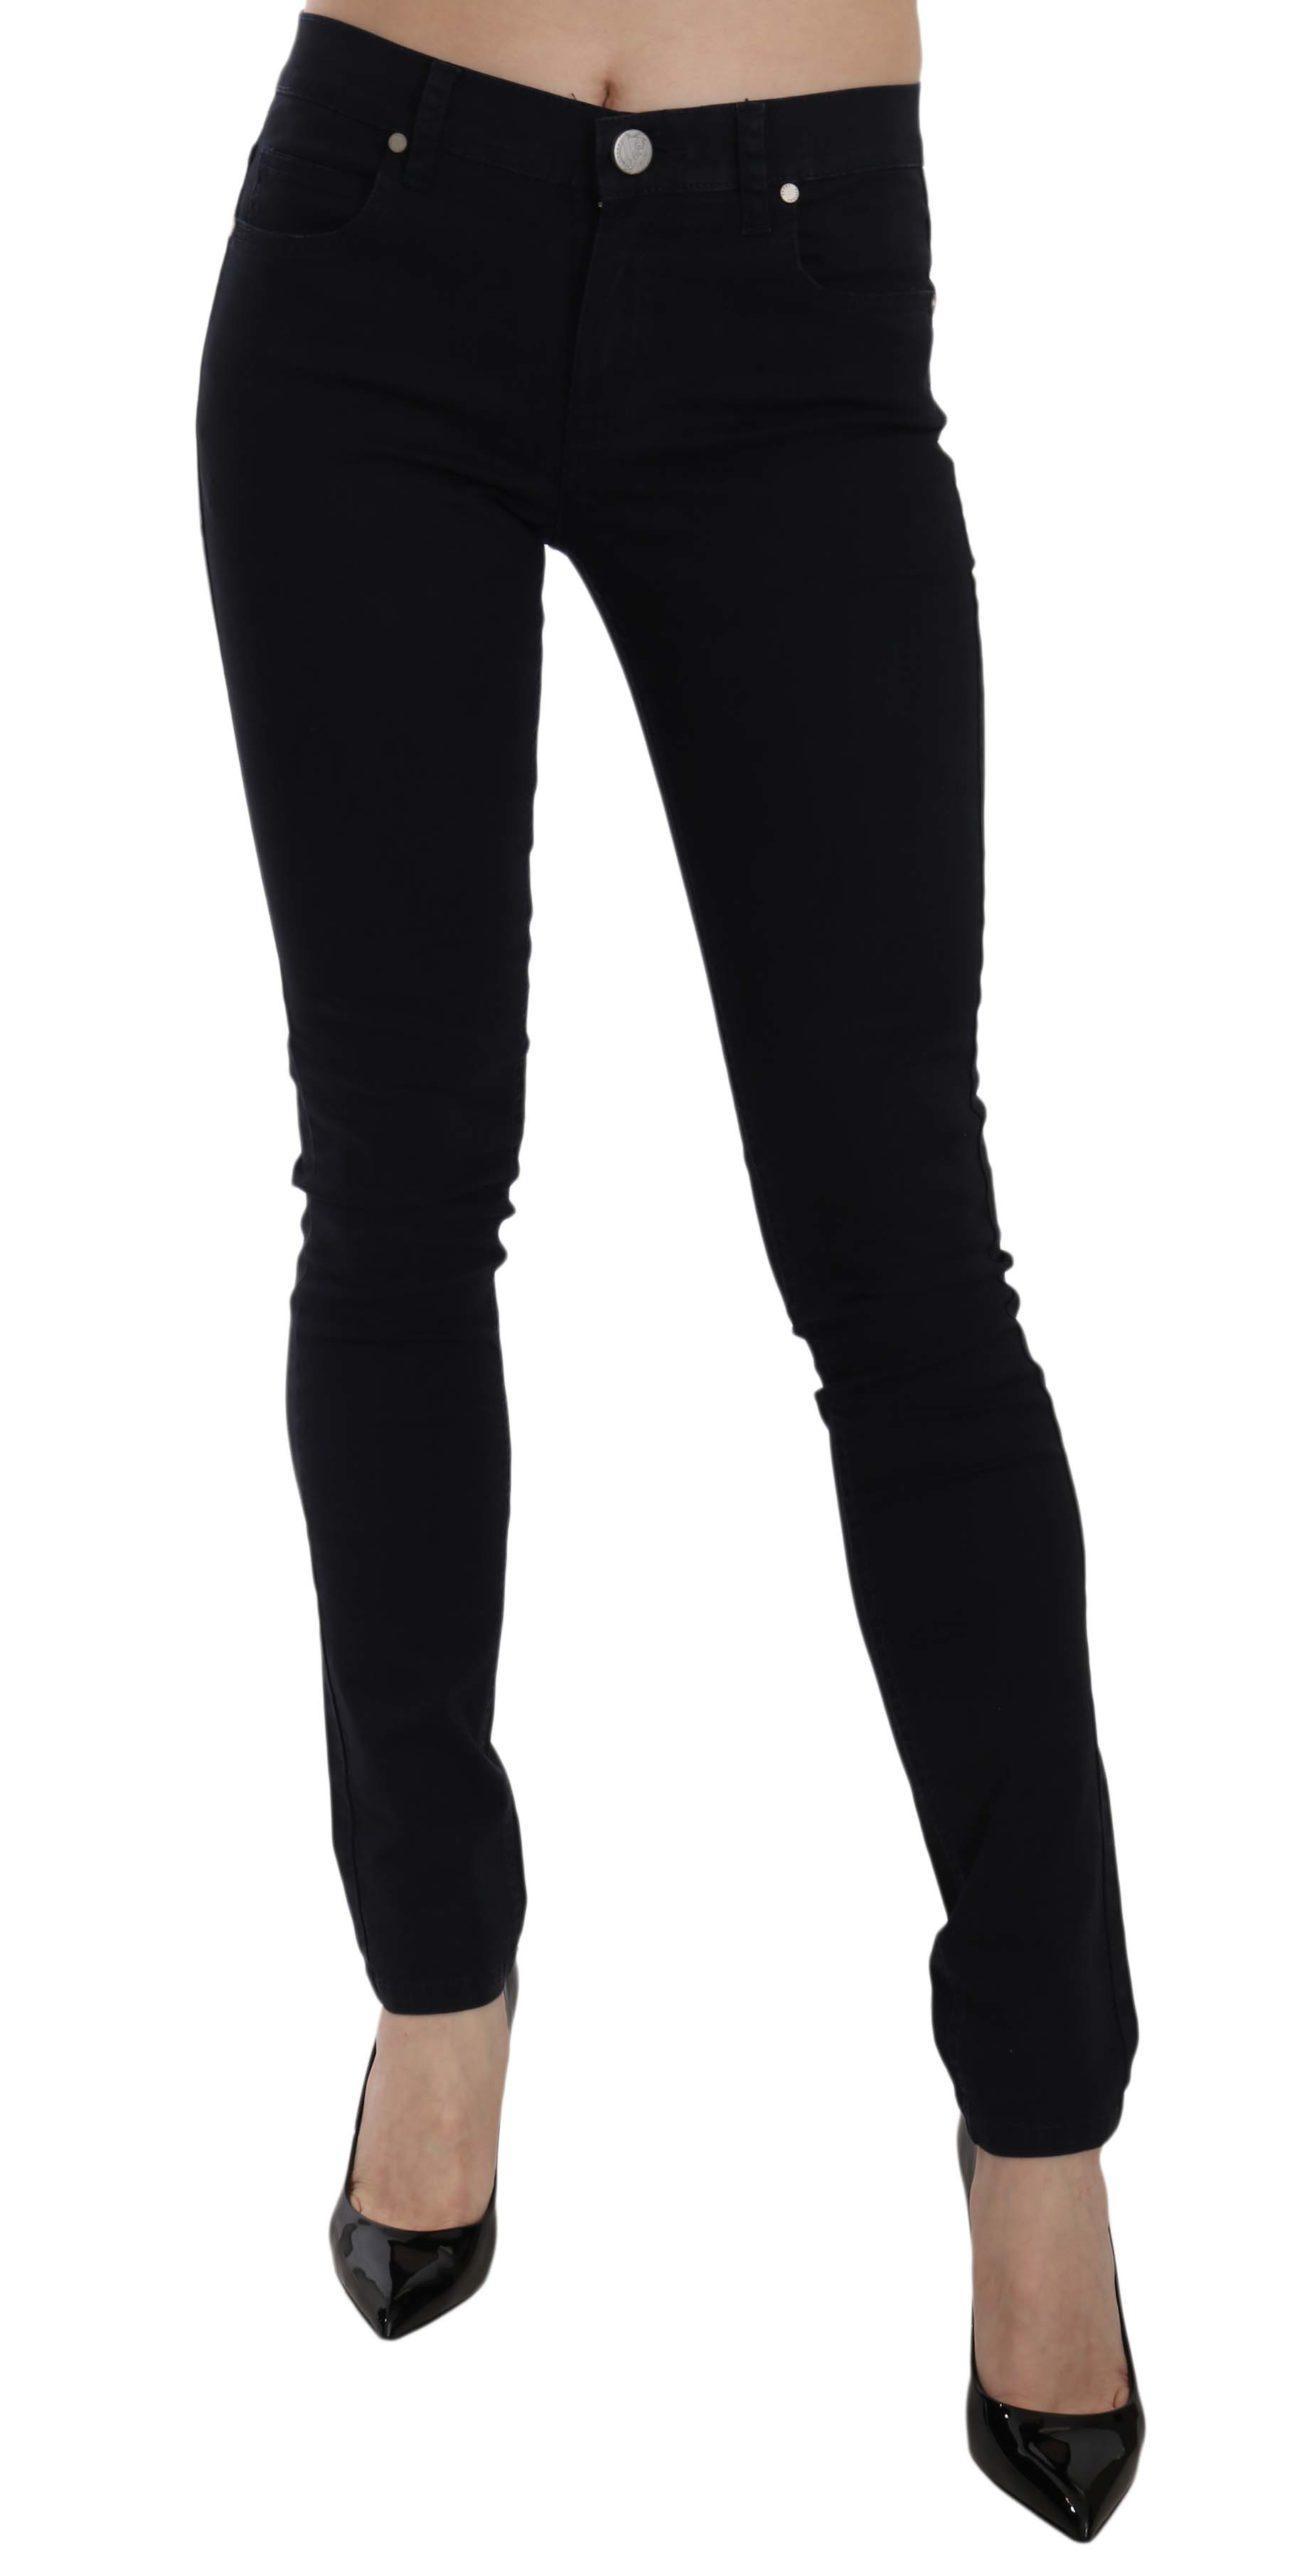 Versace Jeans Women's Gabardine Stretch Luxor Slim Trouser Blue PAN61006 - W30